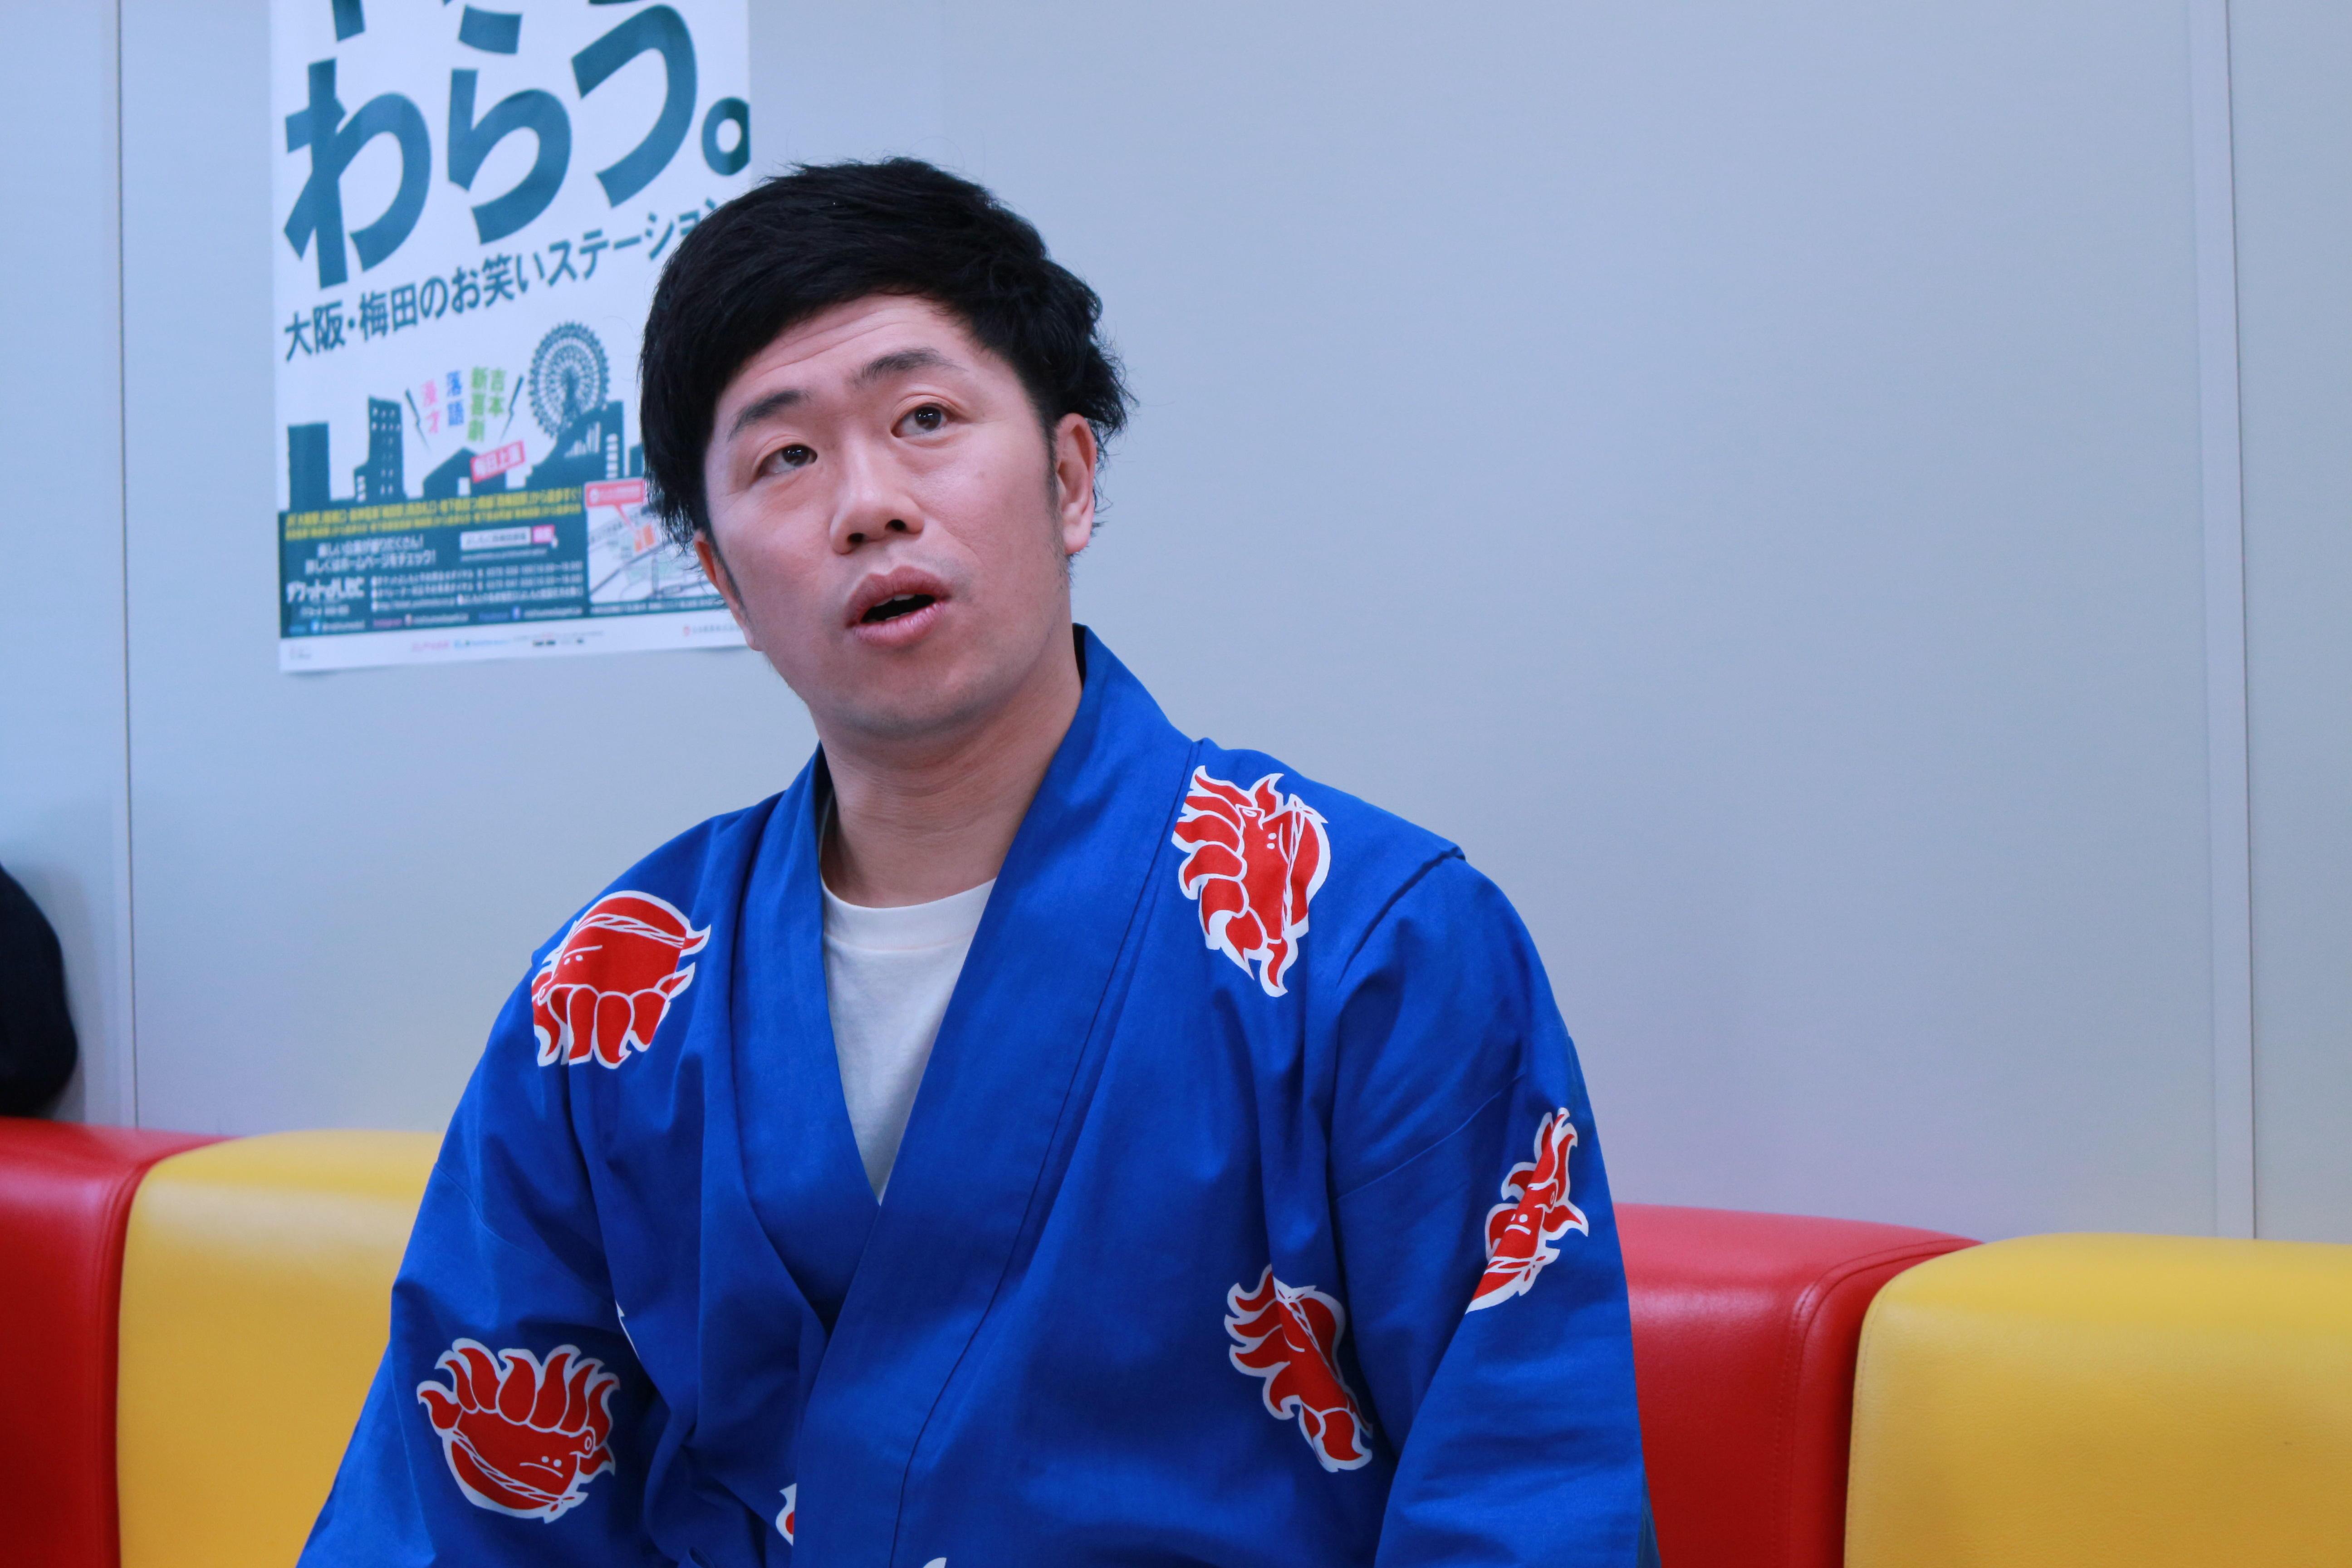 http://news.yoshimoto.co.jp/20180119025143-31ddaf18e18393115828415644ea74cd57d10622.jpg